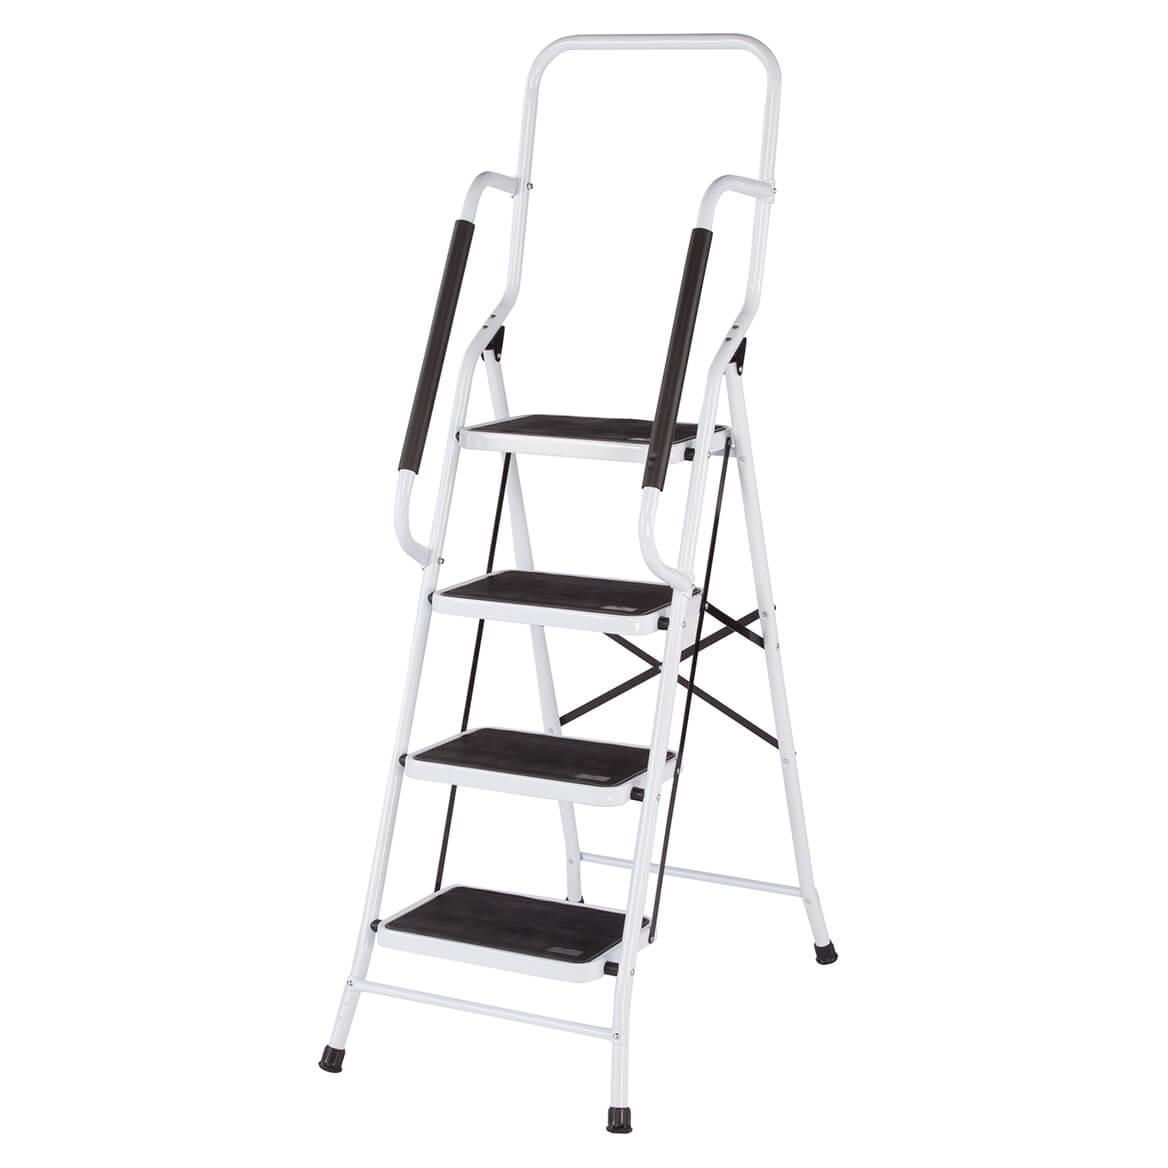 Folding Four Step Ladder With Handrails By Livingsuretm Xl